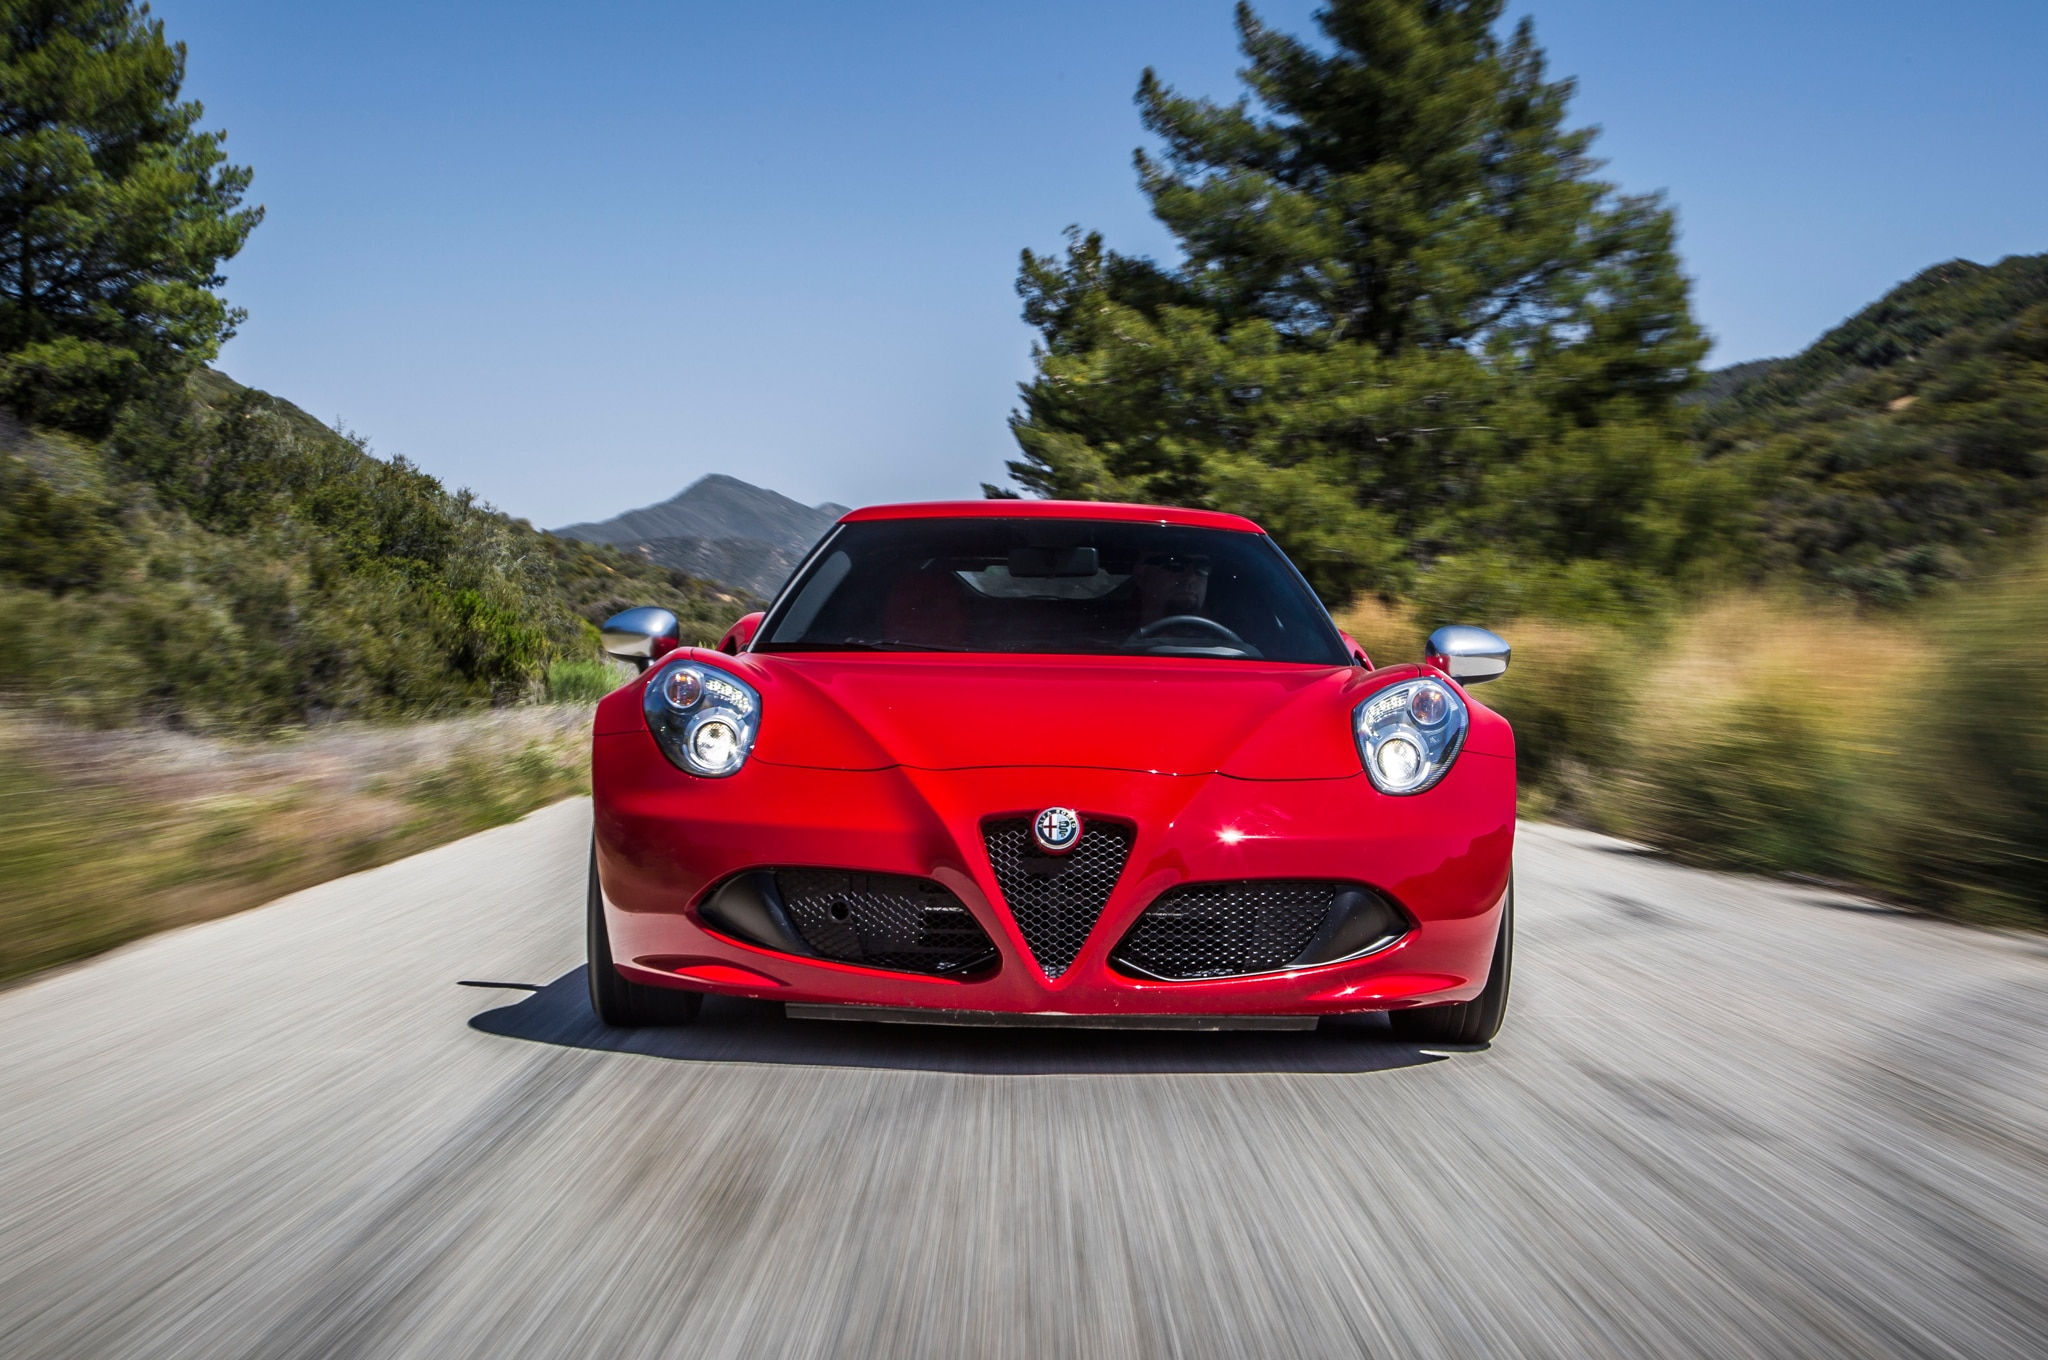 Alfa Romeo C Front View In Motion on Alfa Romeo Spider Door Panel